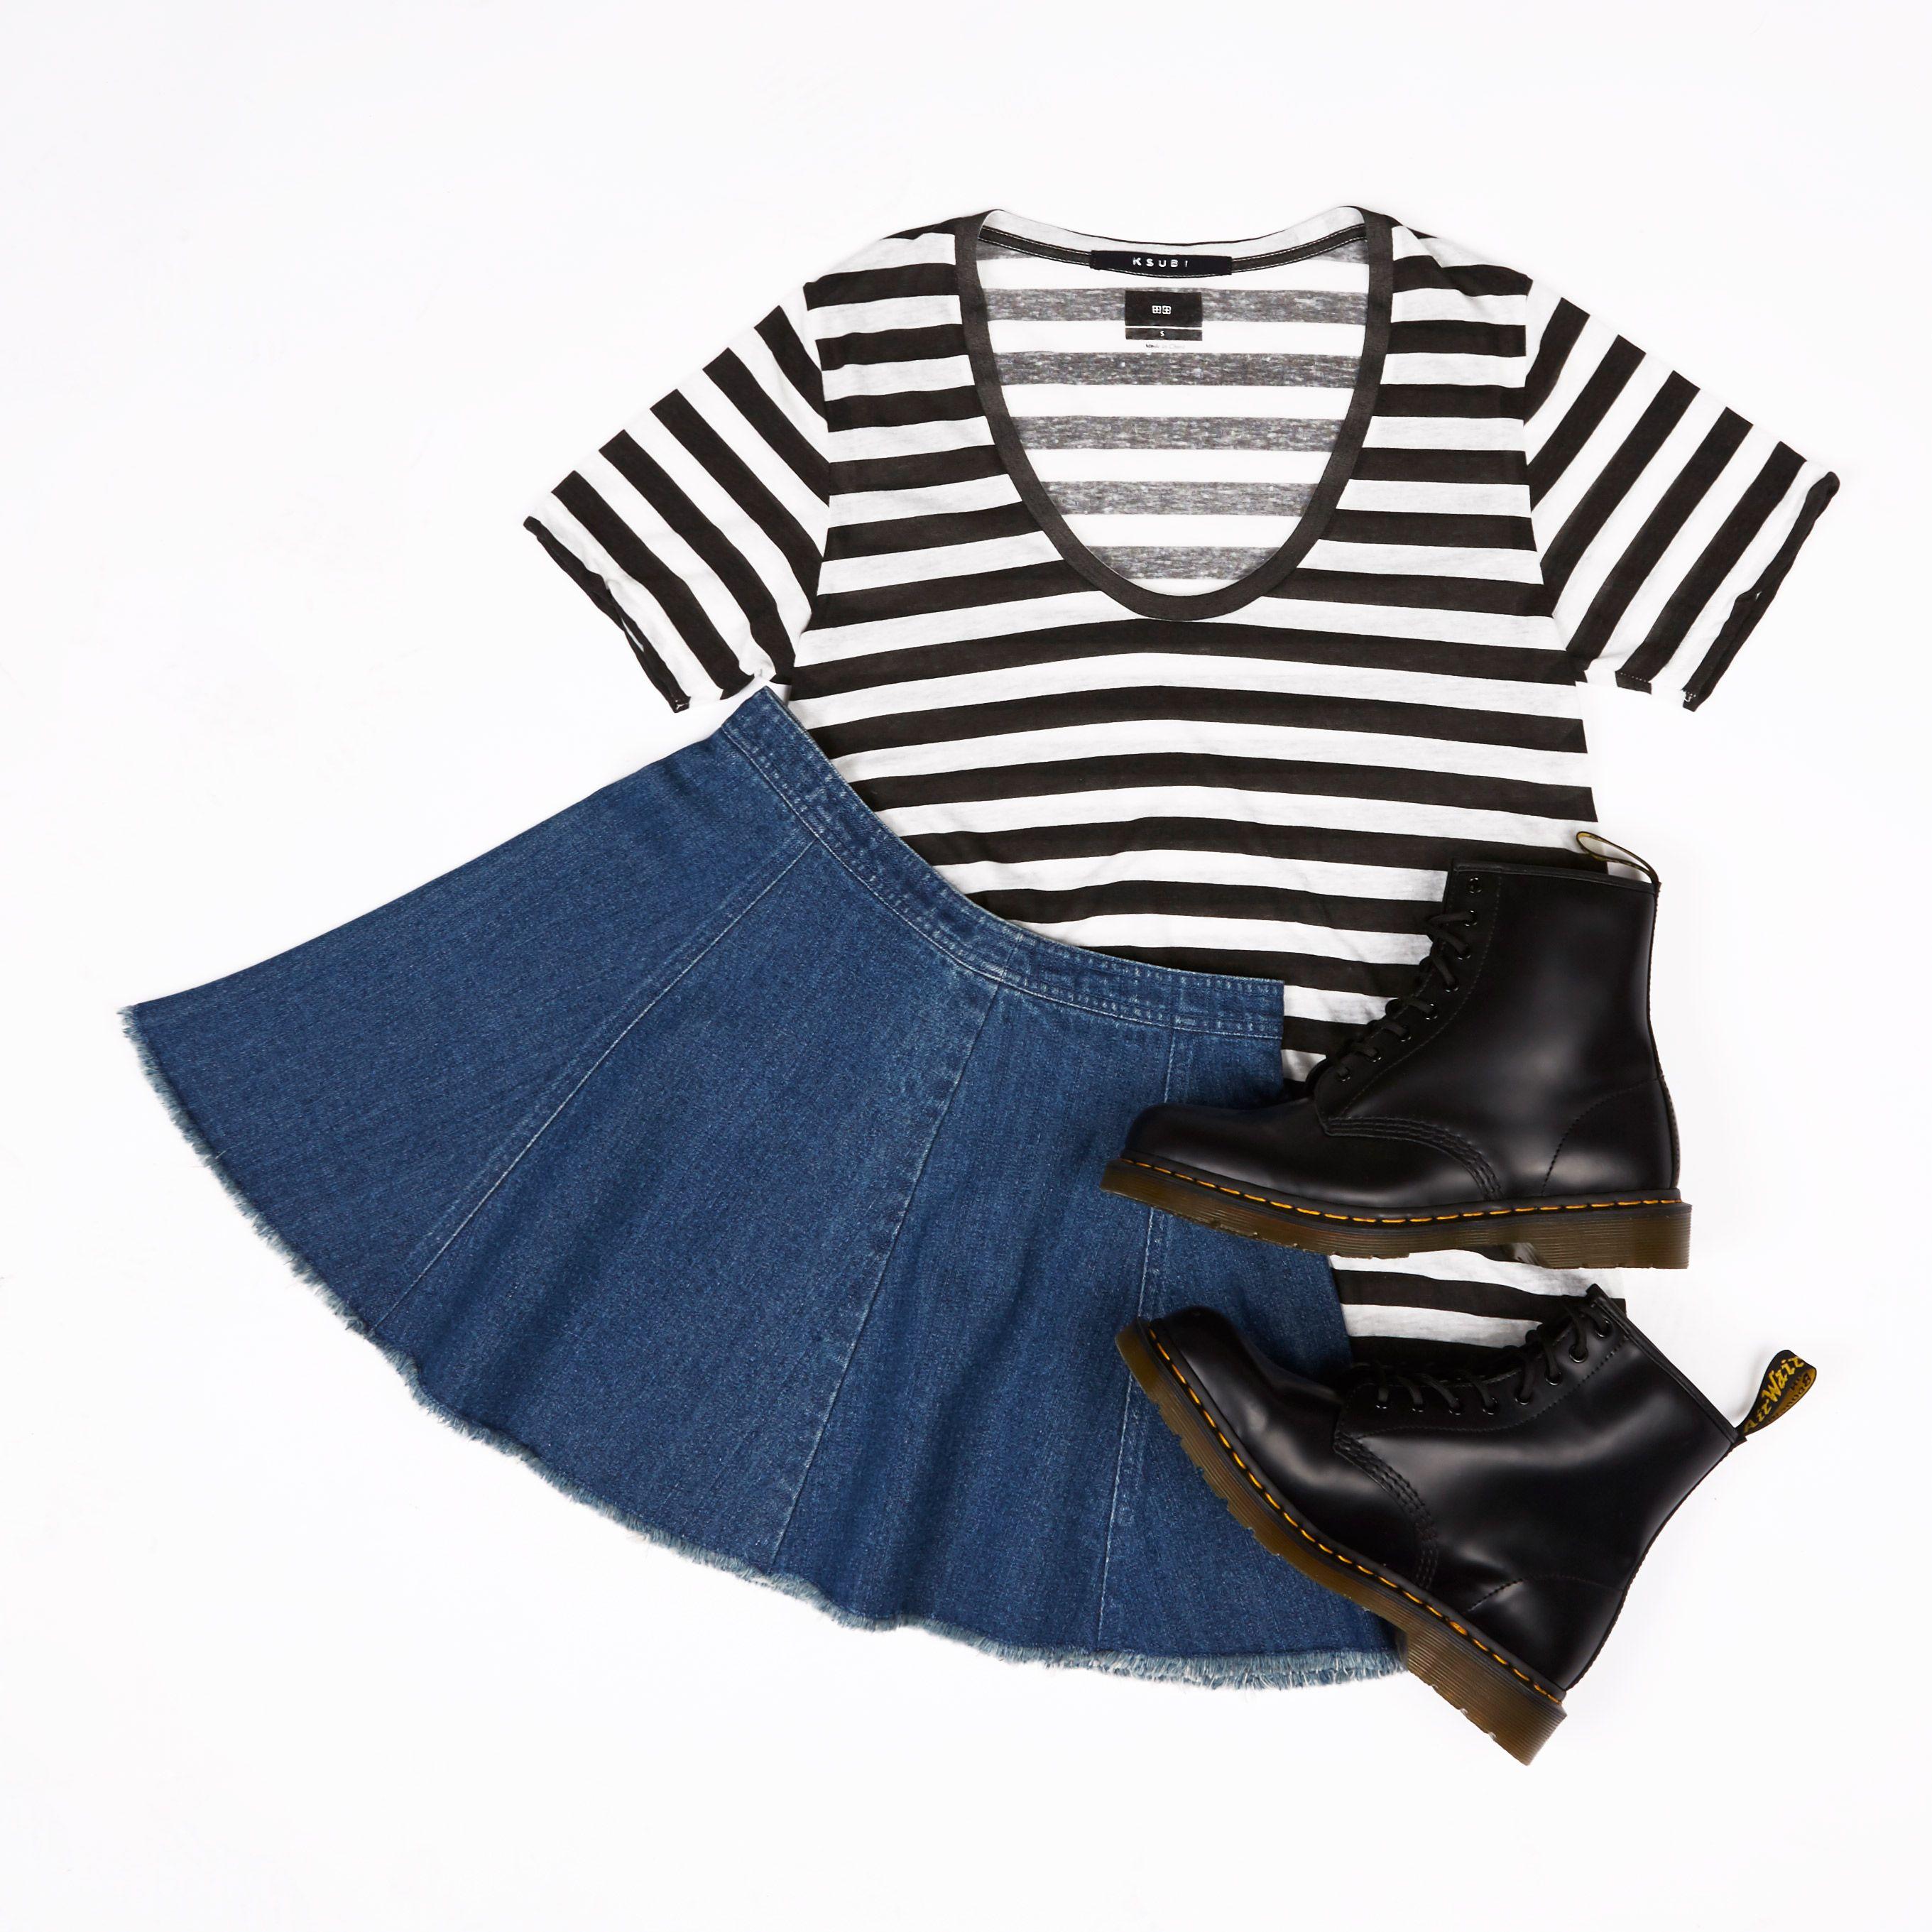 Raw edges are in. Get frayed. #dontaskamanda #chambrayskirt #denimskirt #flatlay #ladiesfashion #streetwear #drmartens #ksubi #generalpants